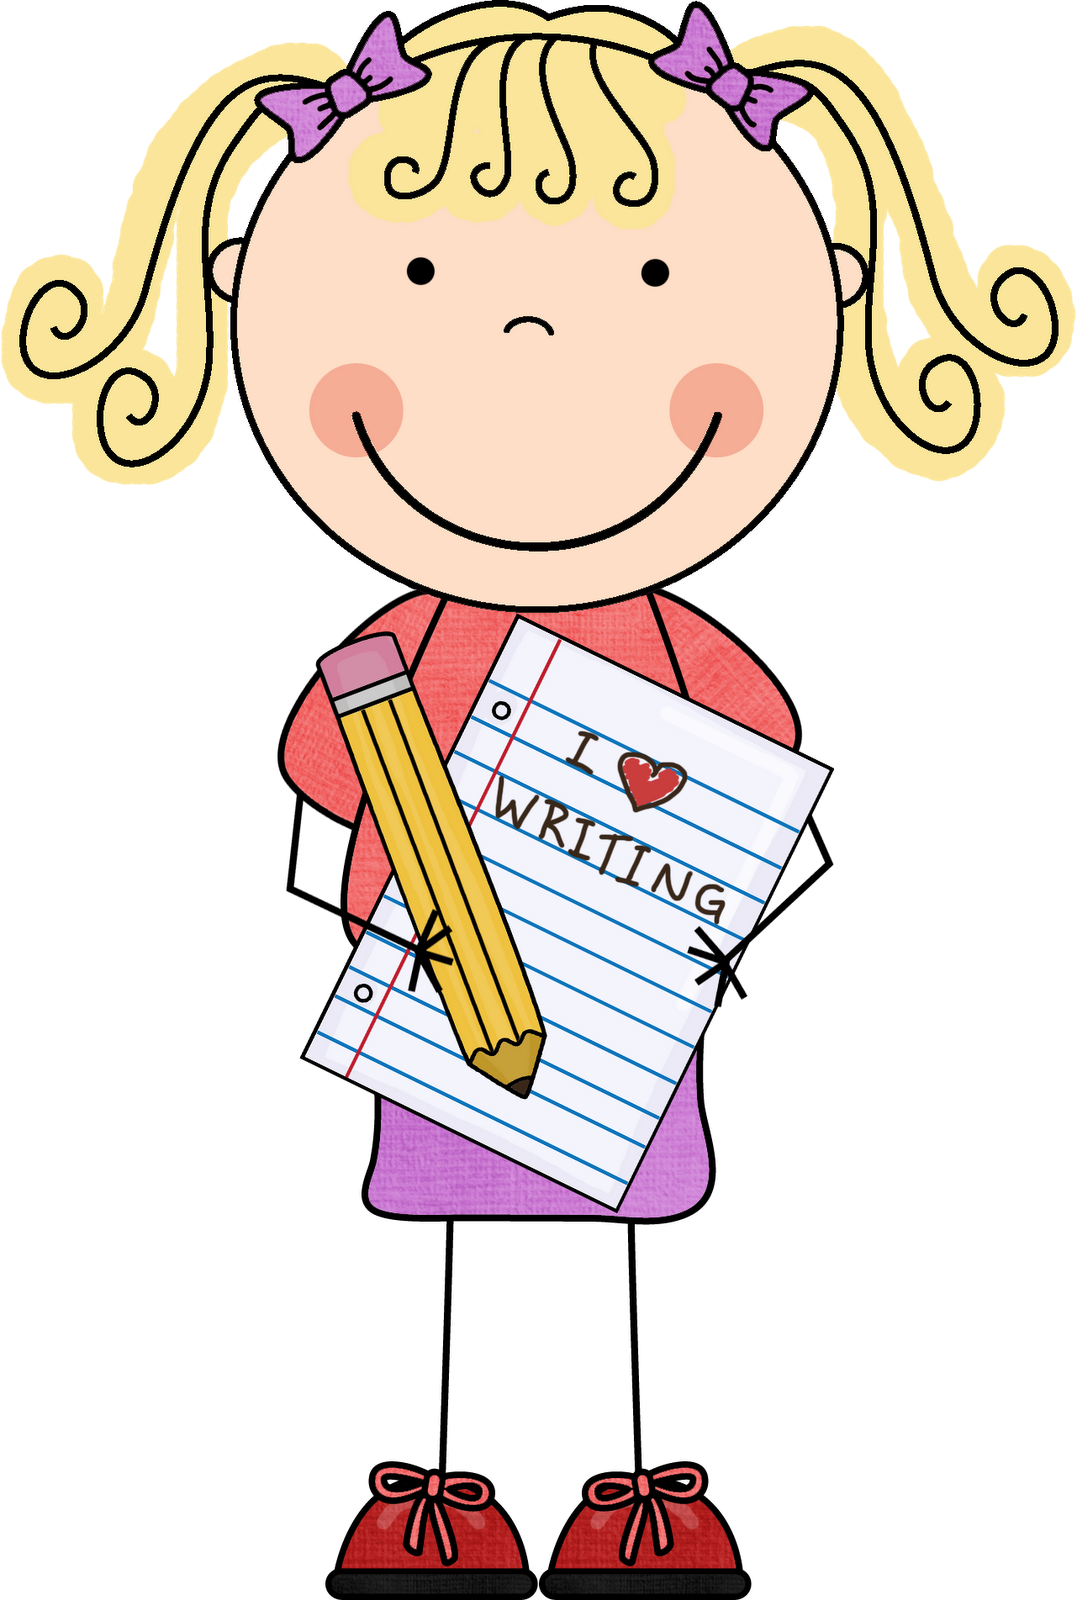 Student writing clipart-Student writing clipart-16